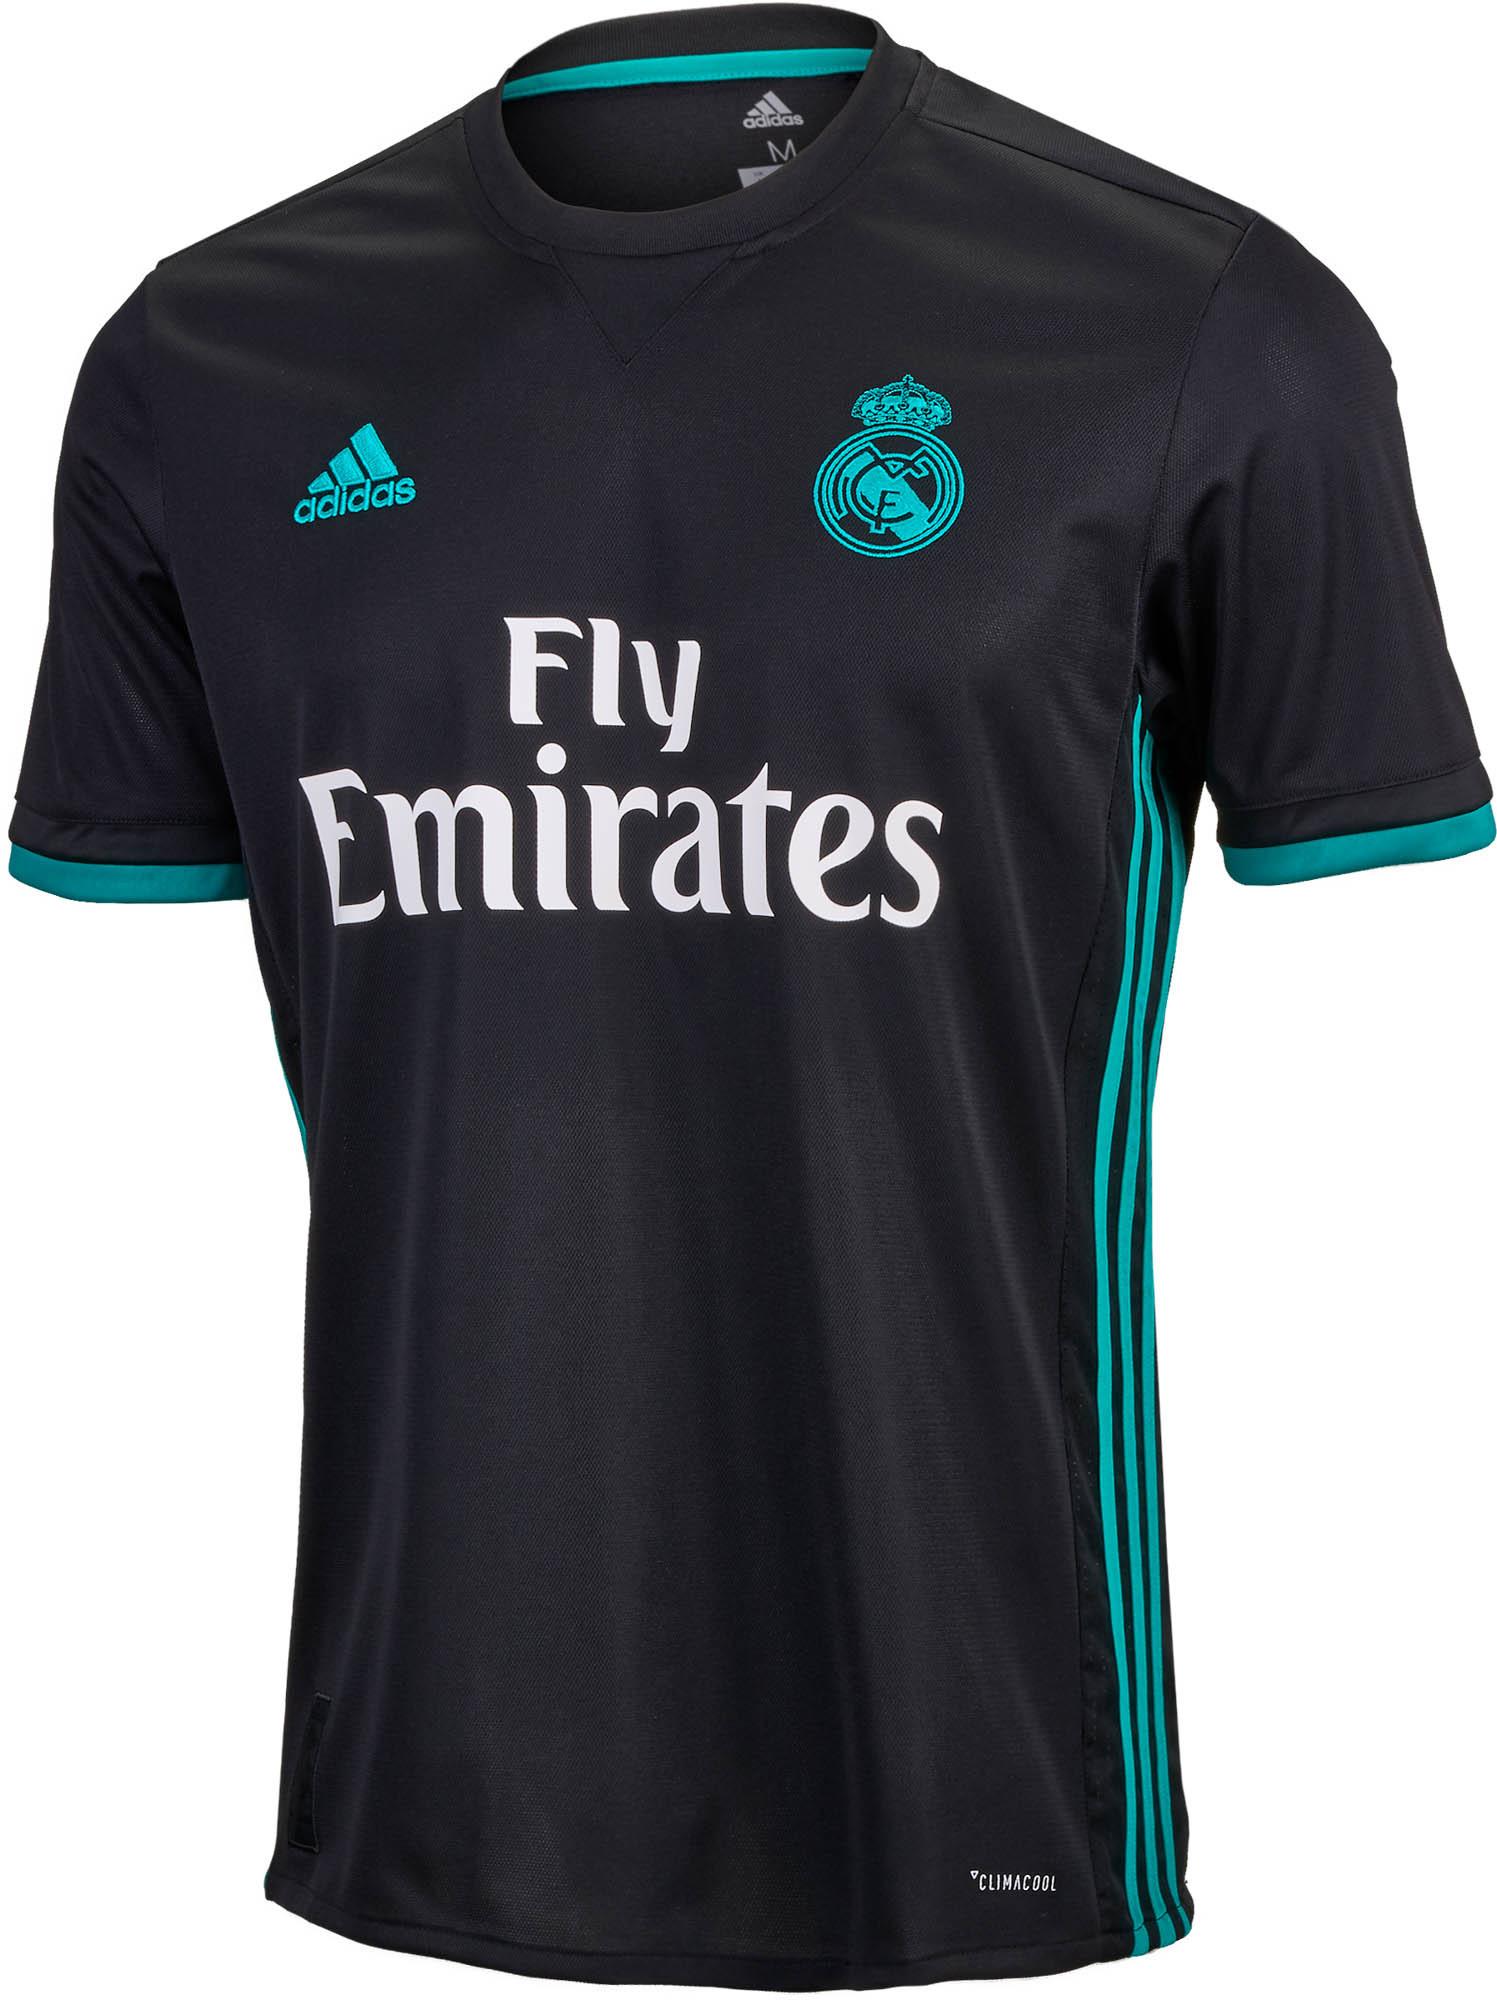 4d5fba52a adidas Kids Real Madrid Away Jersey - 2017 18 Jerseys